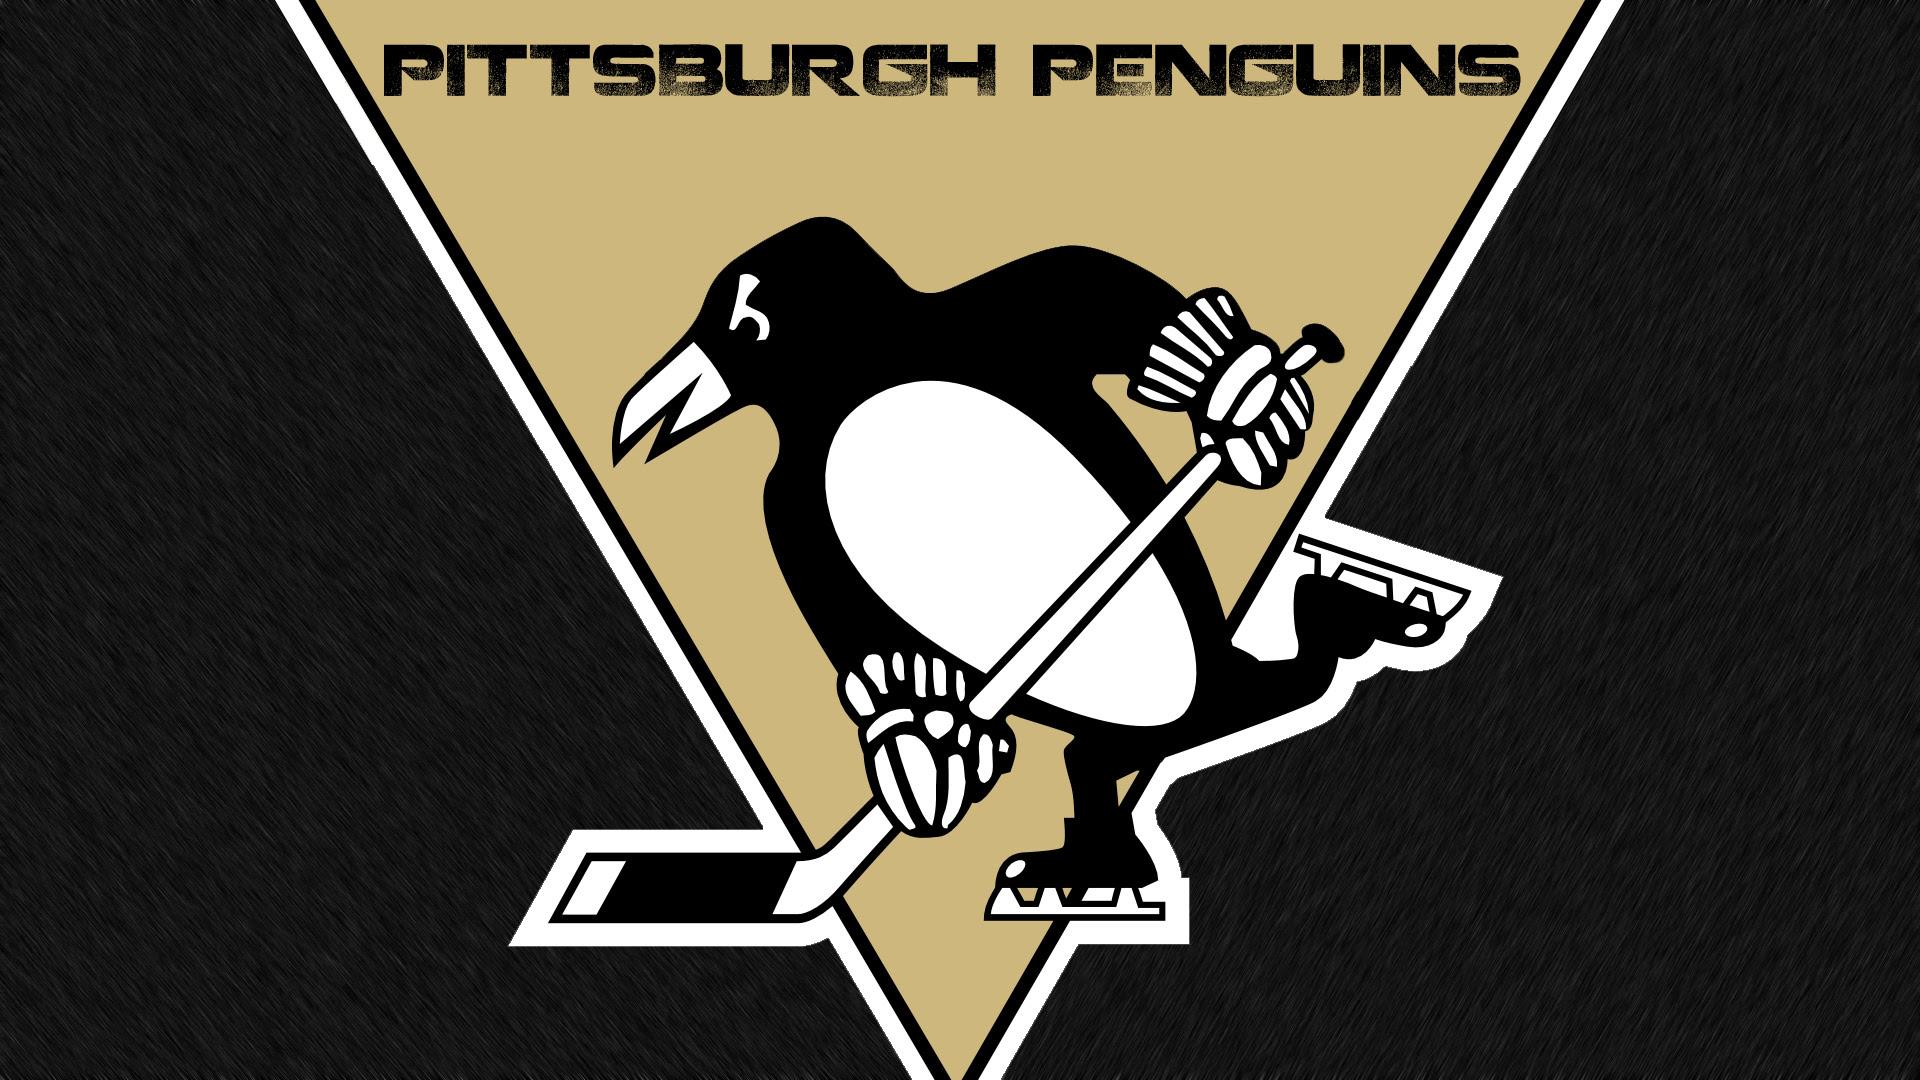 Pittsburgh Penguins Logo Wallpapers   PixelsTalk.Net